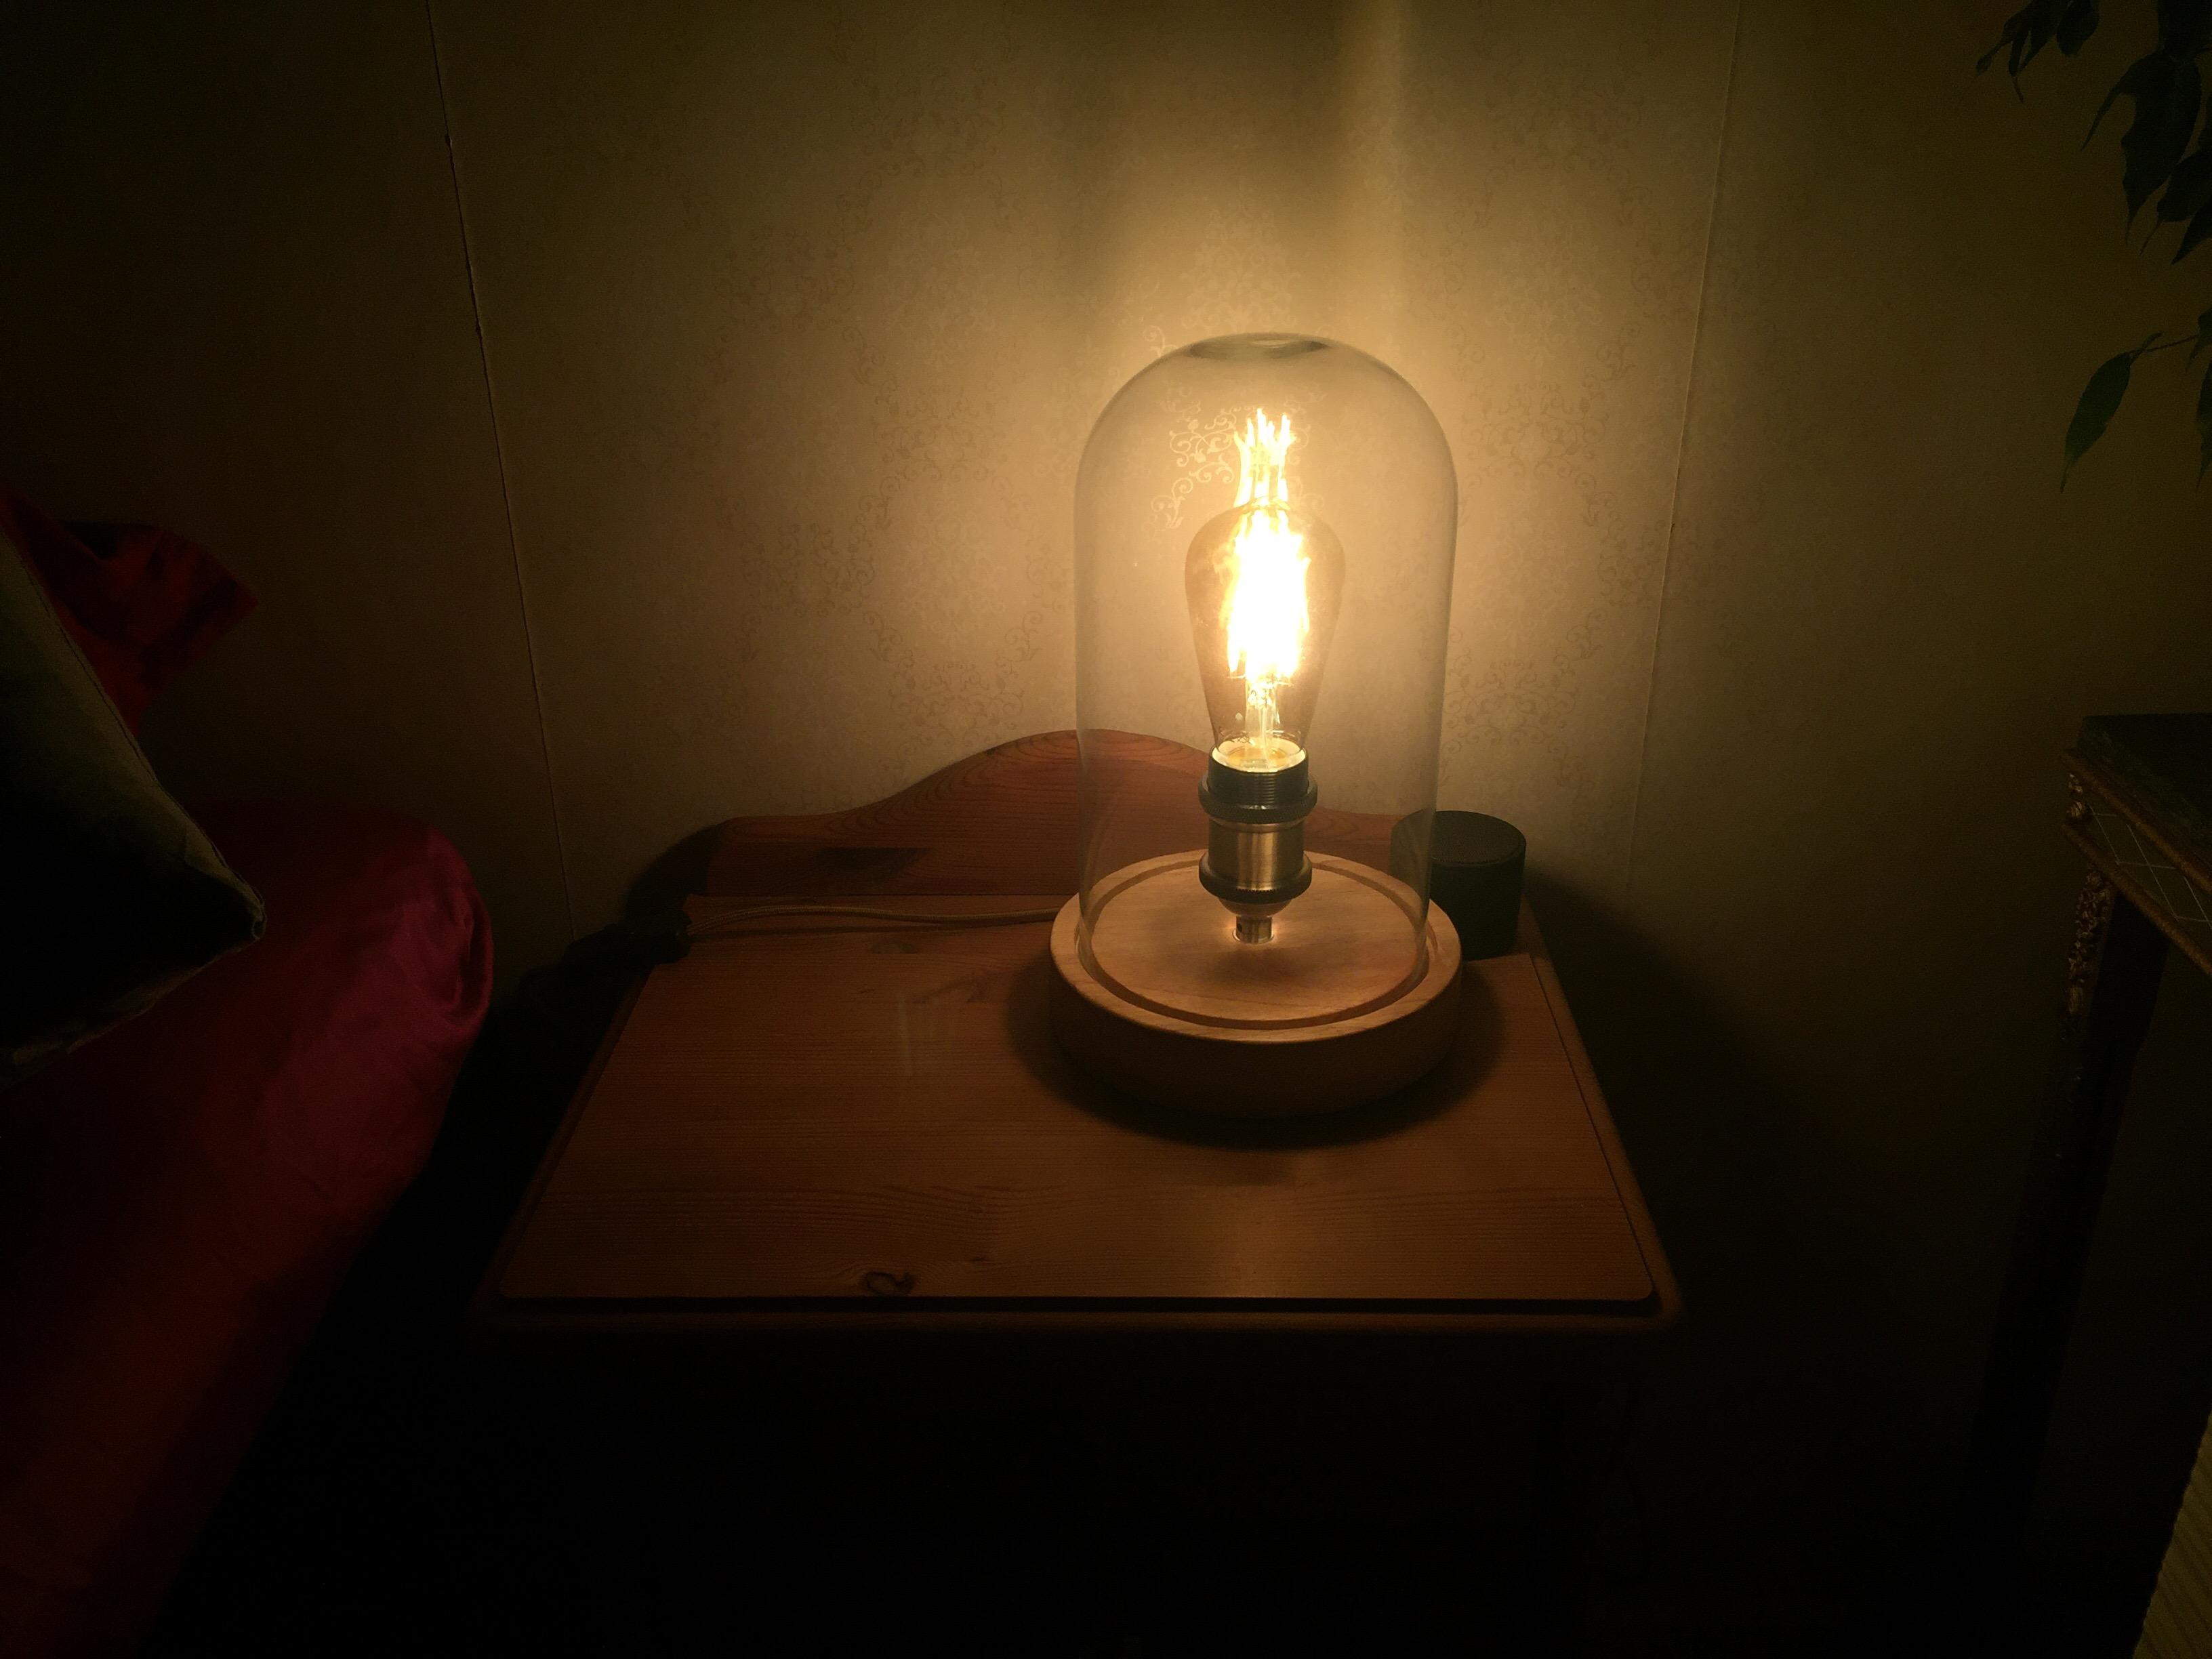 Mys belysning